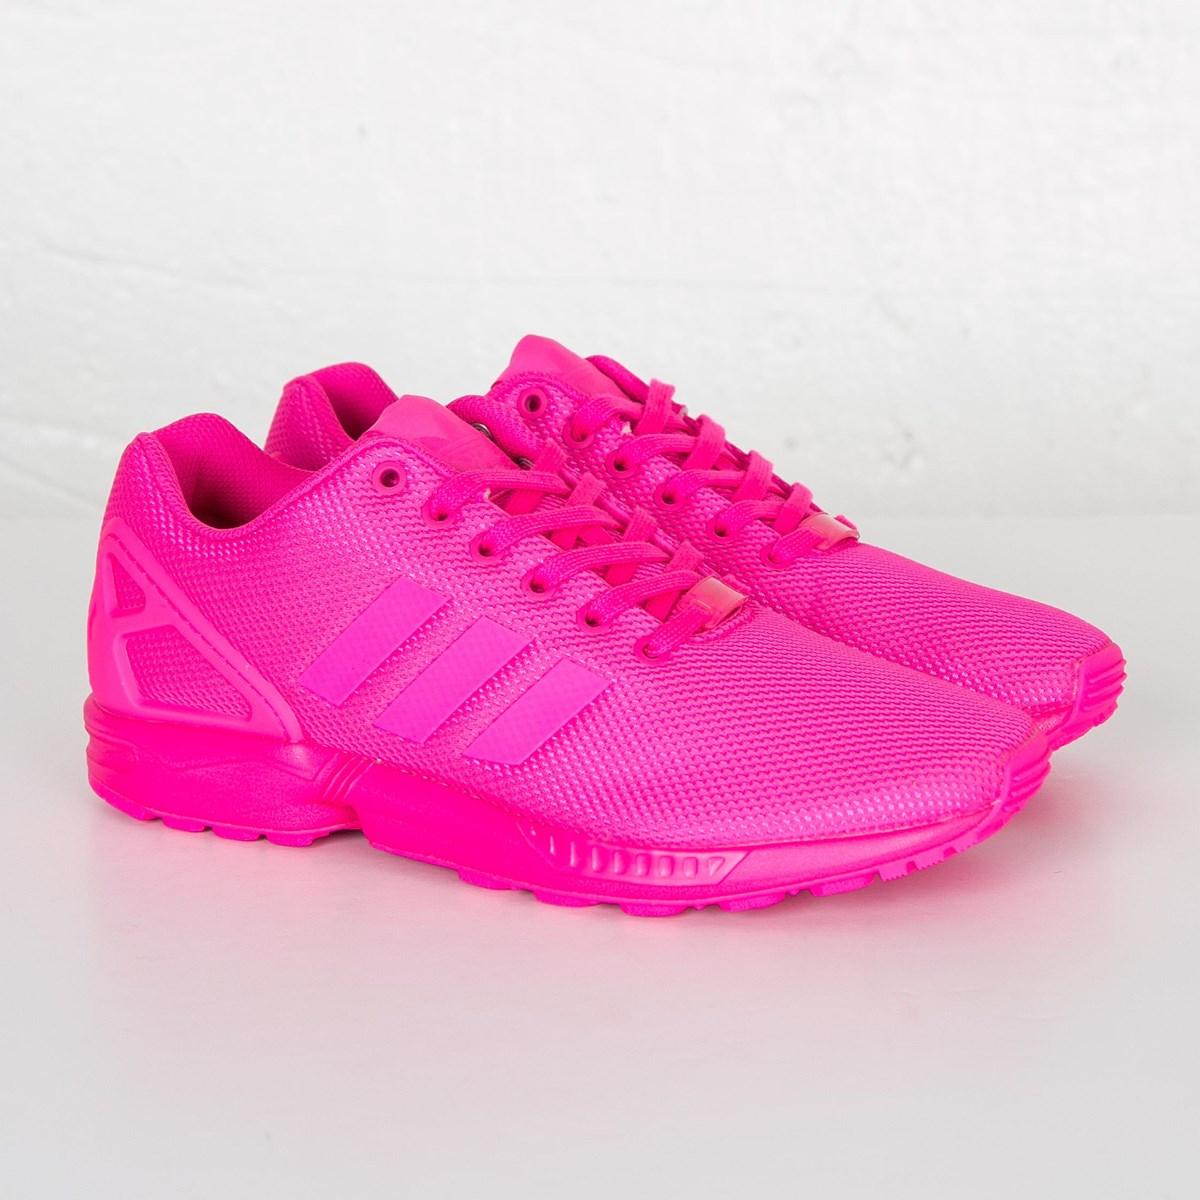 955cbd16f adidas ZX Flux - S75490 - Sneakersnstuff